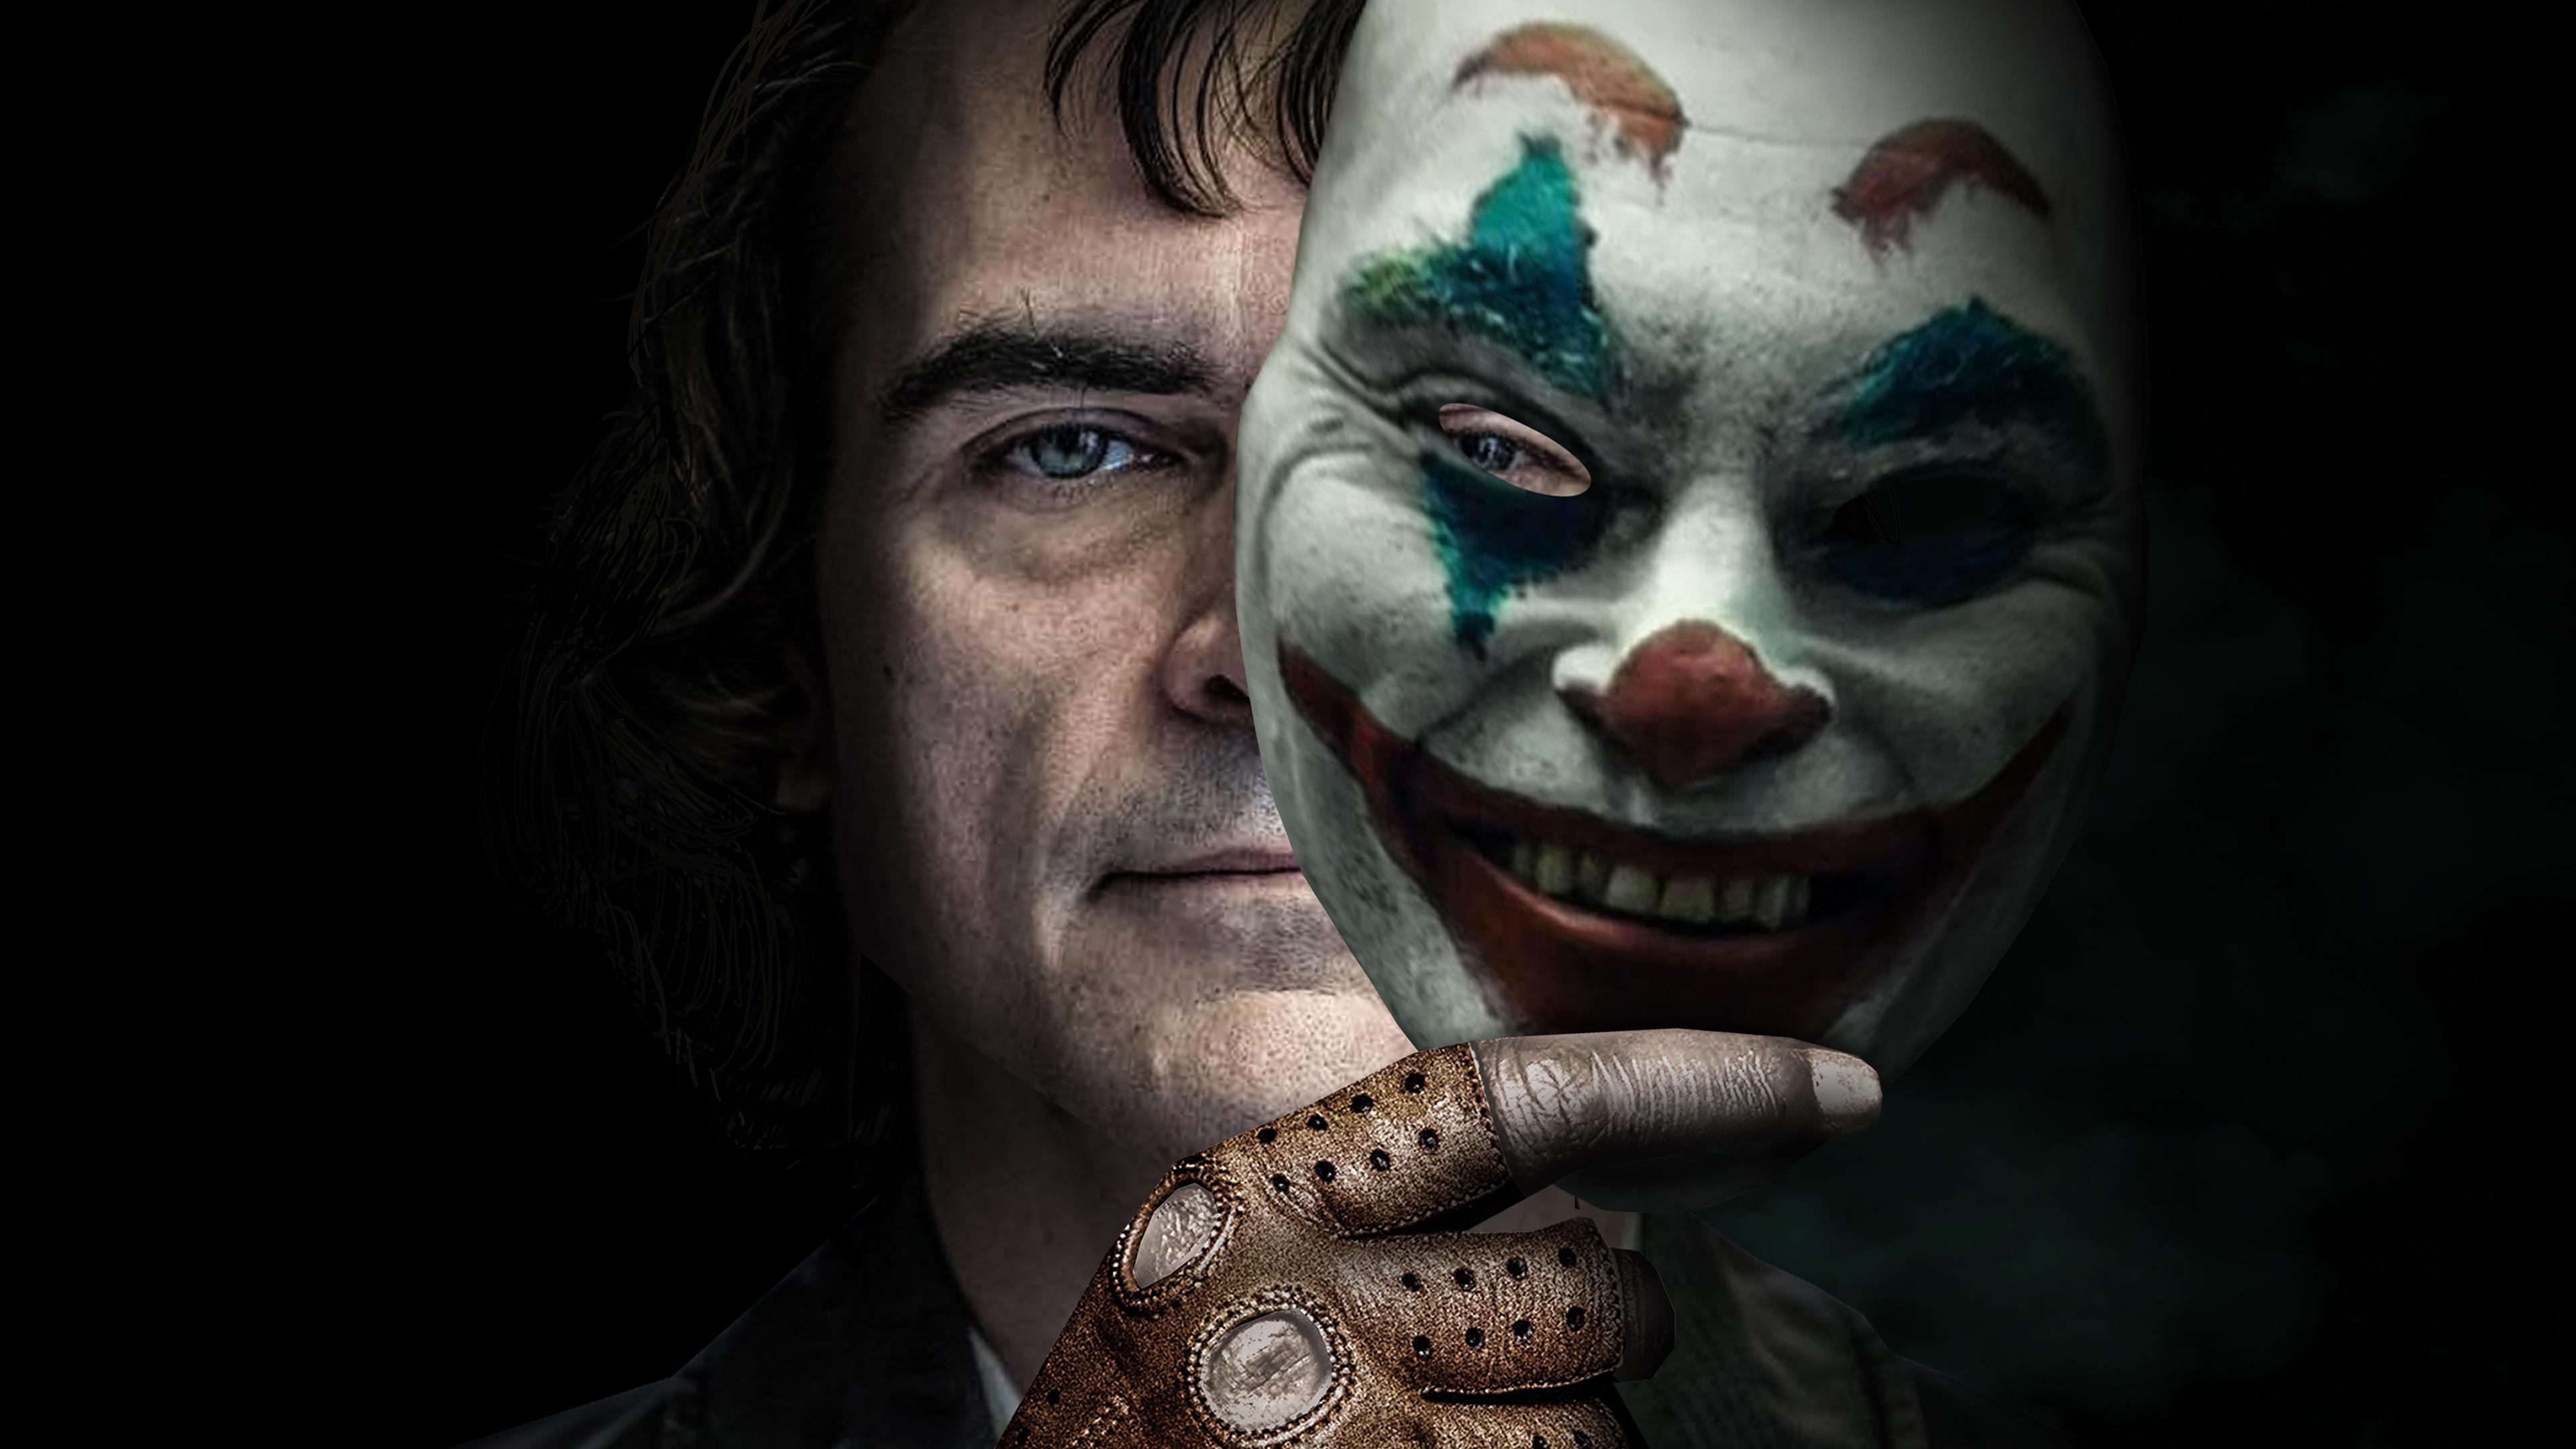 joker 2019 movie 4k 1558219919 - Joker 2019 Movie 4k - Wallpapers, movies wallpapers, joker wallpapers, joker movie wallpapers, joaquin phoenix wallpapers, hd-wallpapers, behance wallpapers, 4k-wallpapers, 2019 movies wallpapers